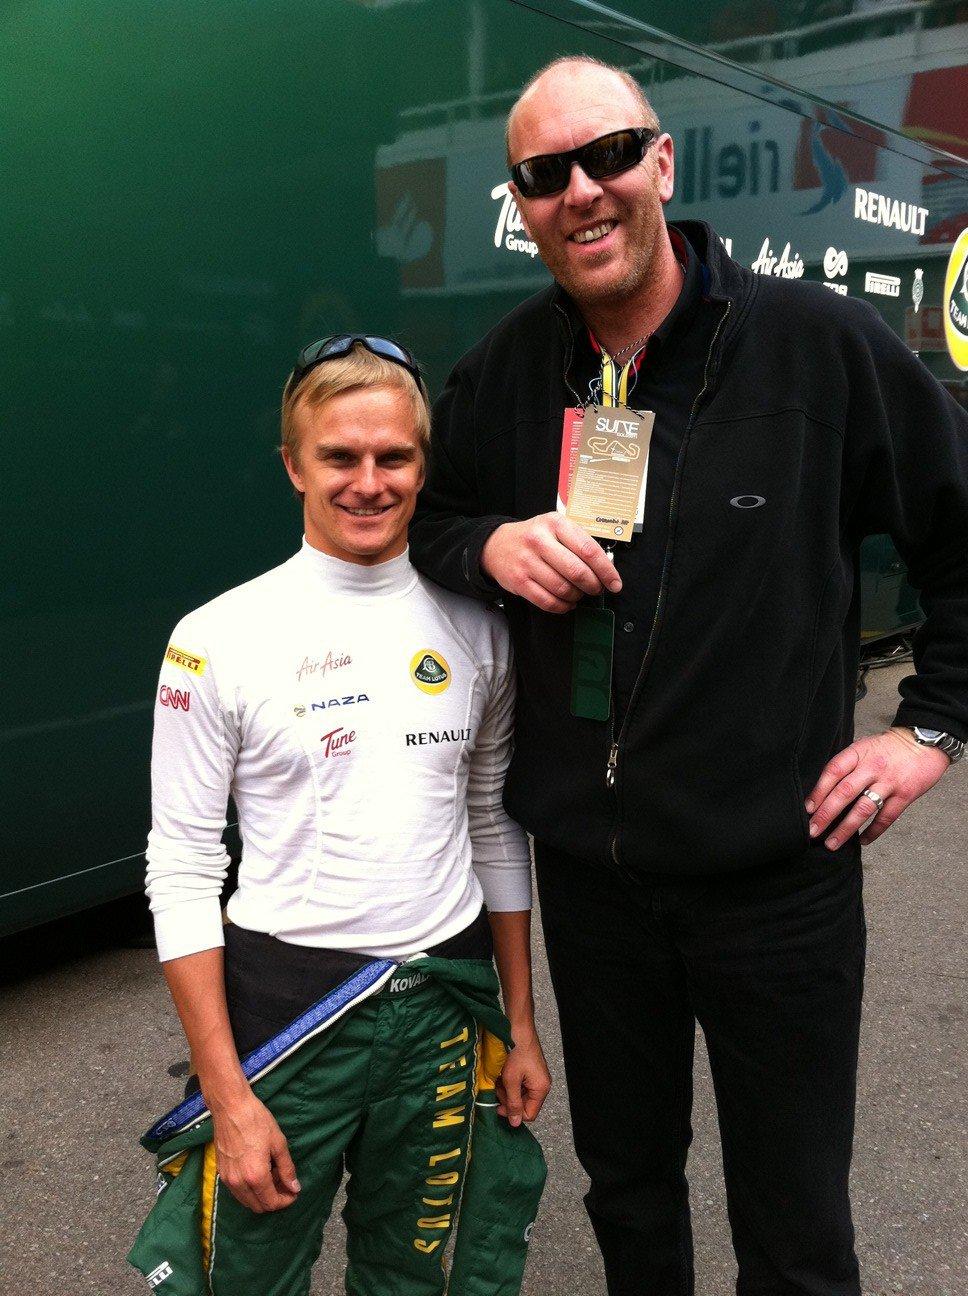 Хейкки Ковалайнен и Джереми Чандлер на предсезонных тестах 2011 в Барселоне